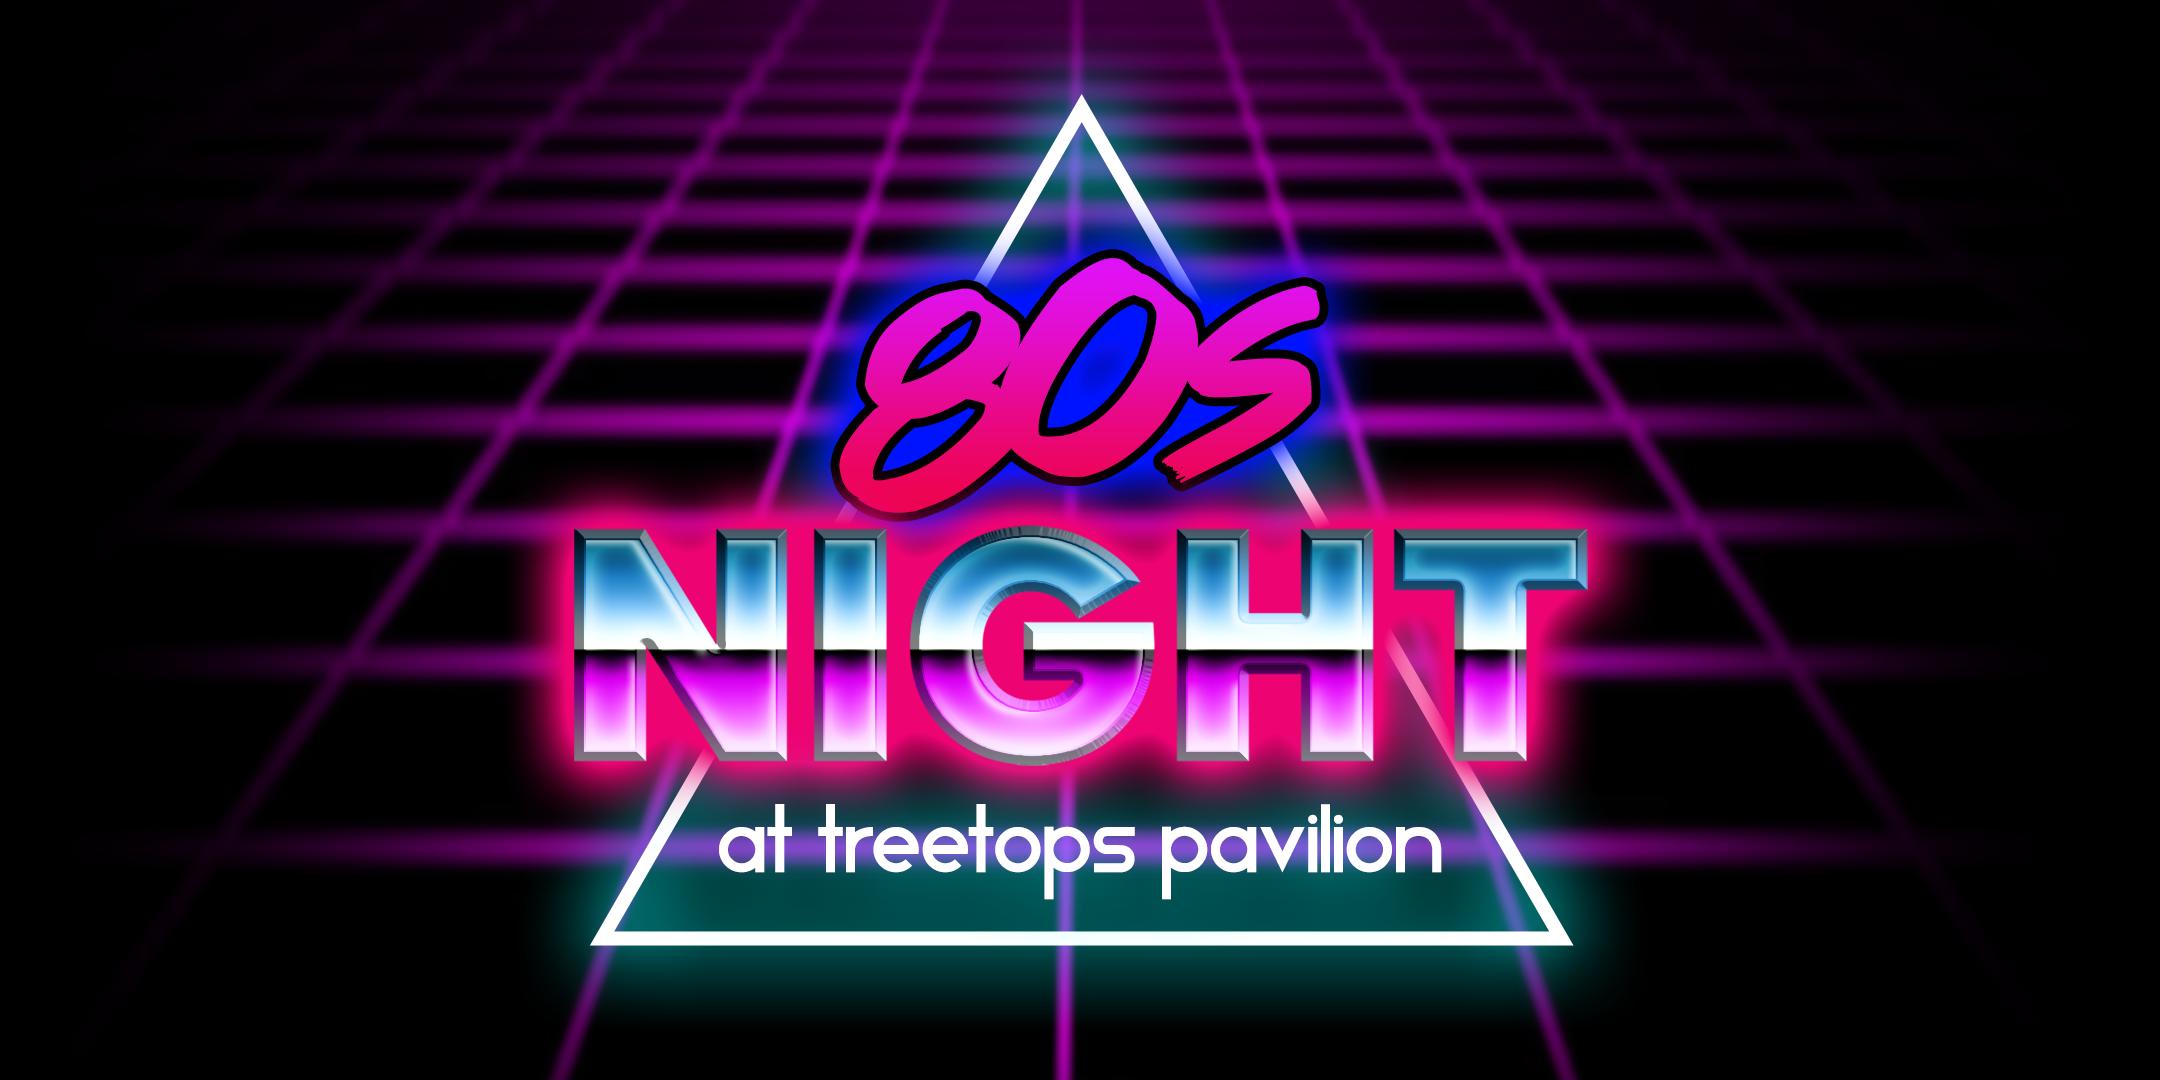 2019-80s-night-Eventbritev2.png